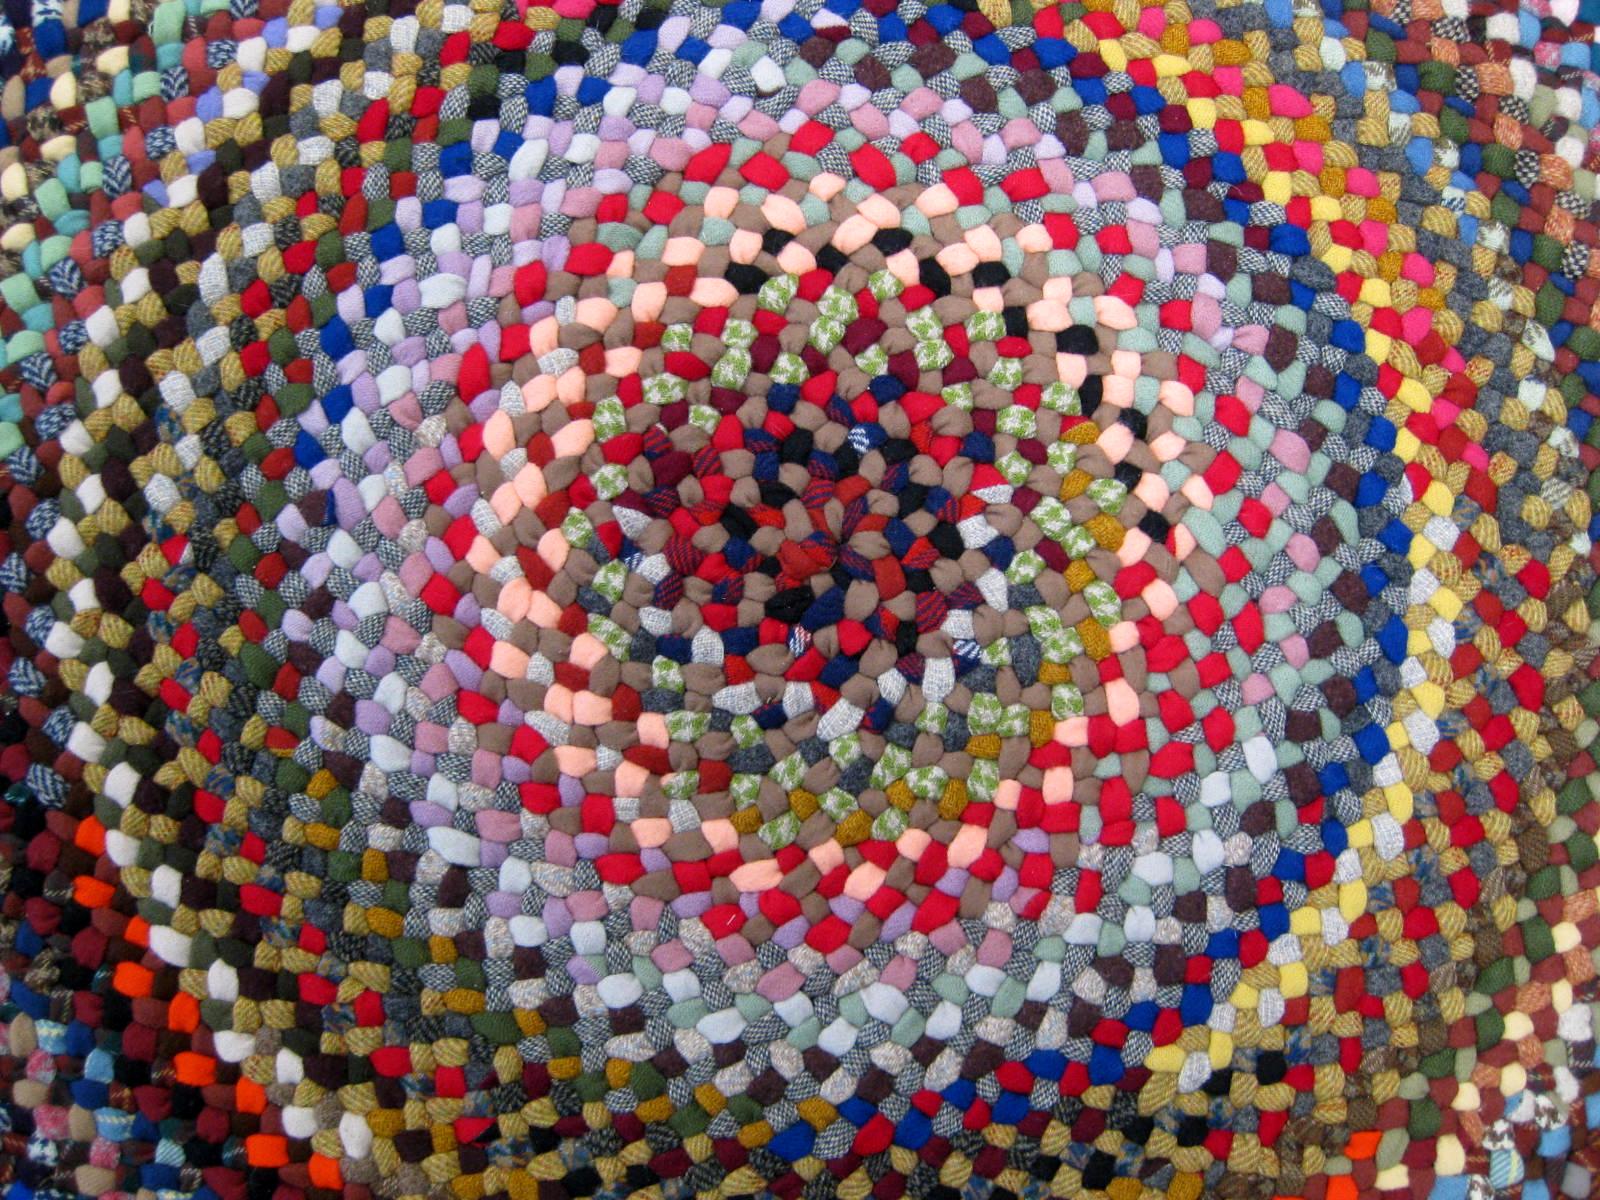 braided rug designs ... fresh round braided rug fetching 3 photos home improvement ... QGIZVZX